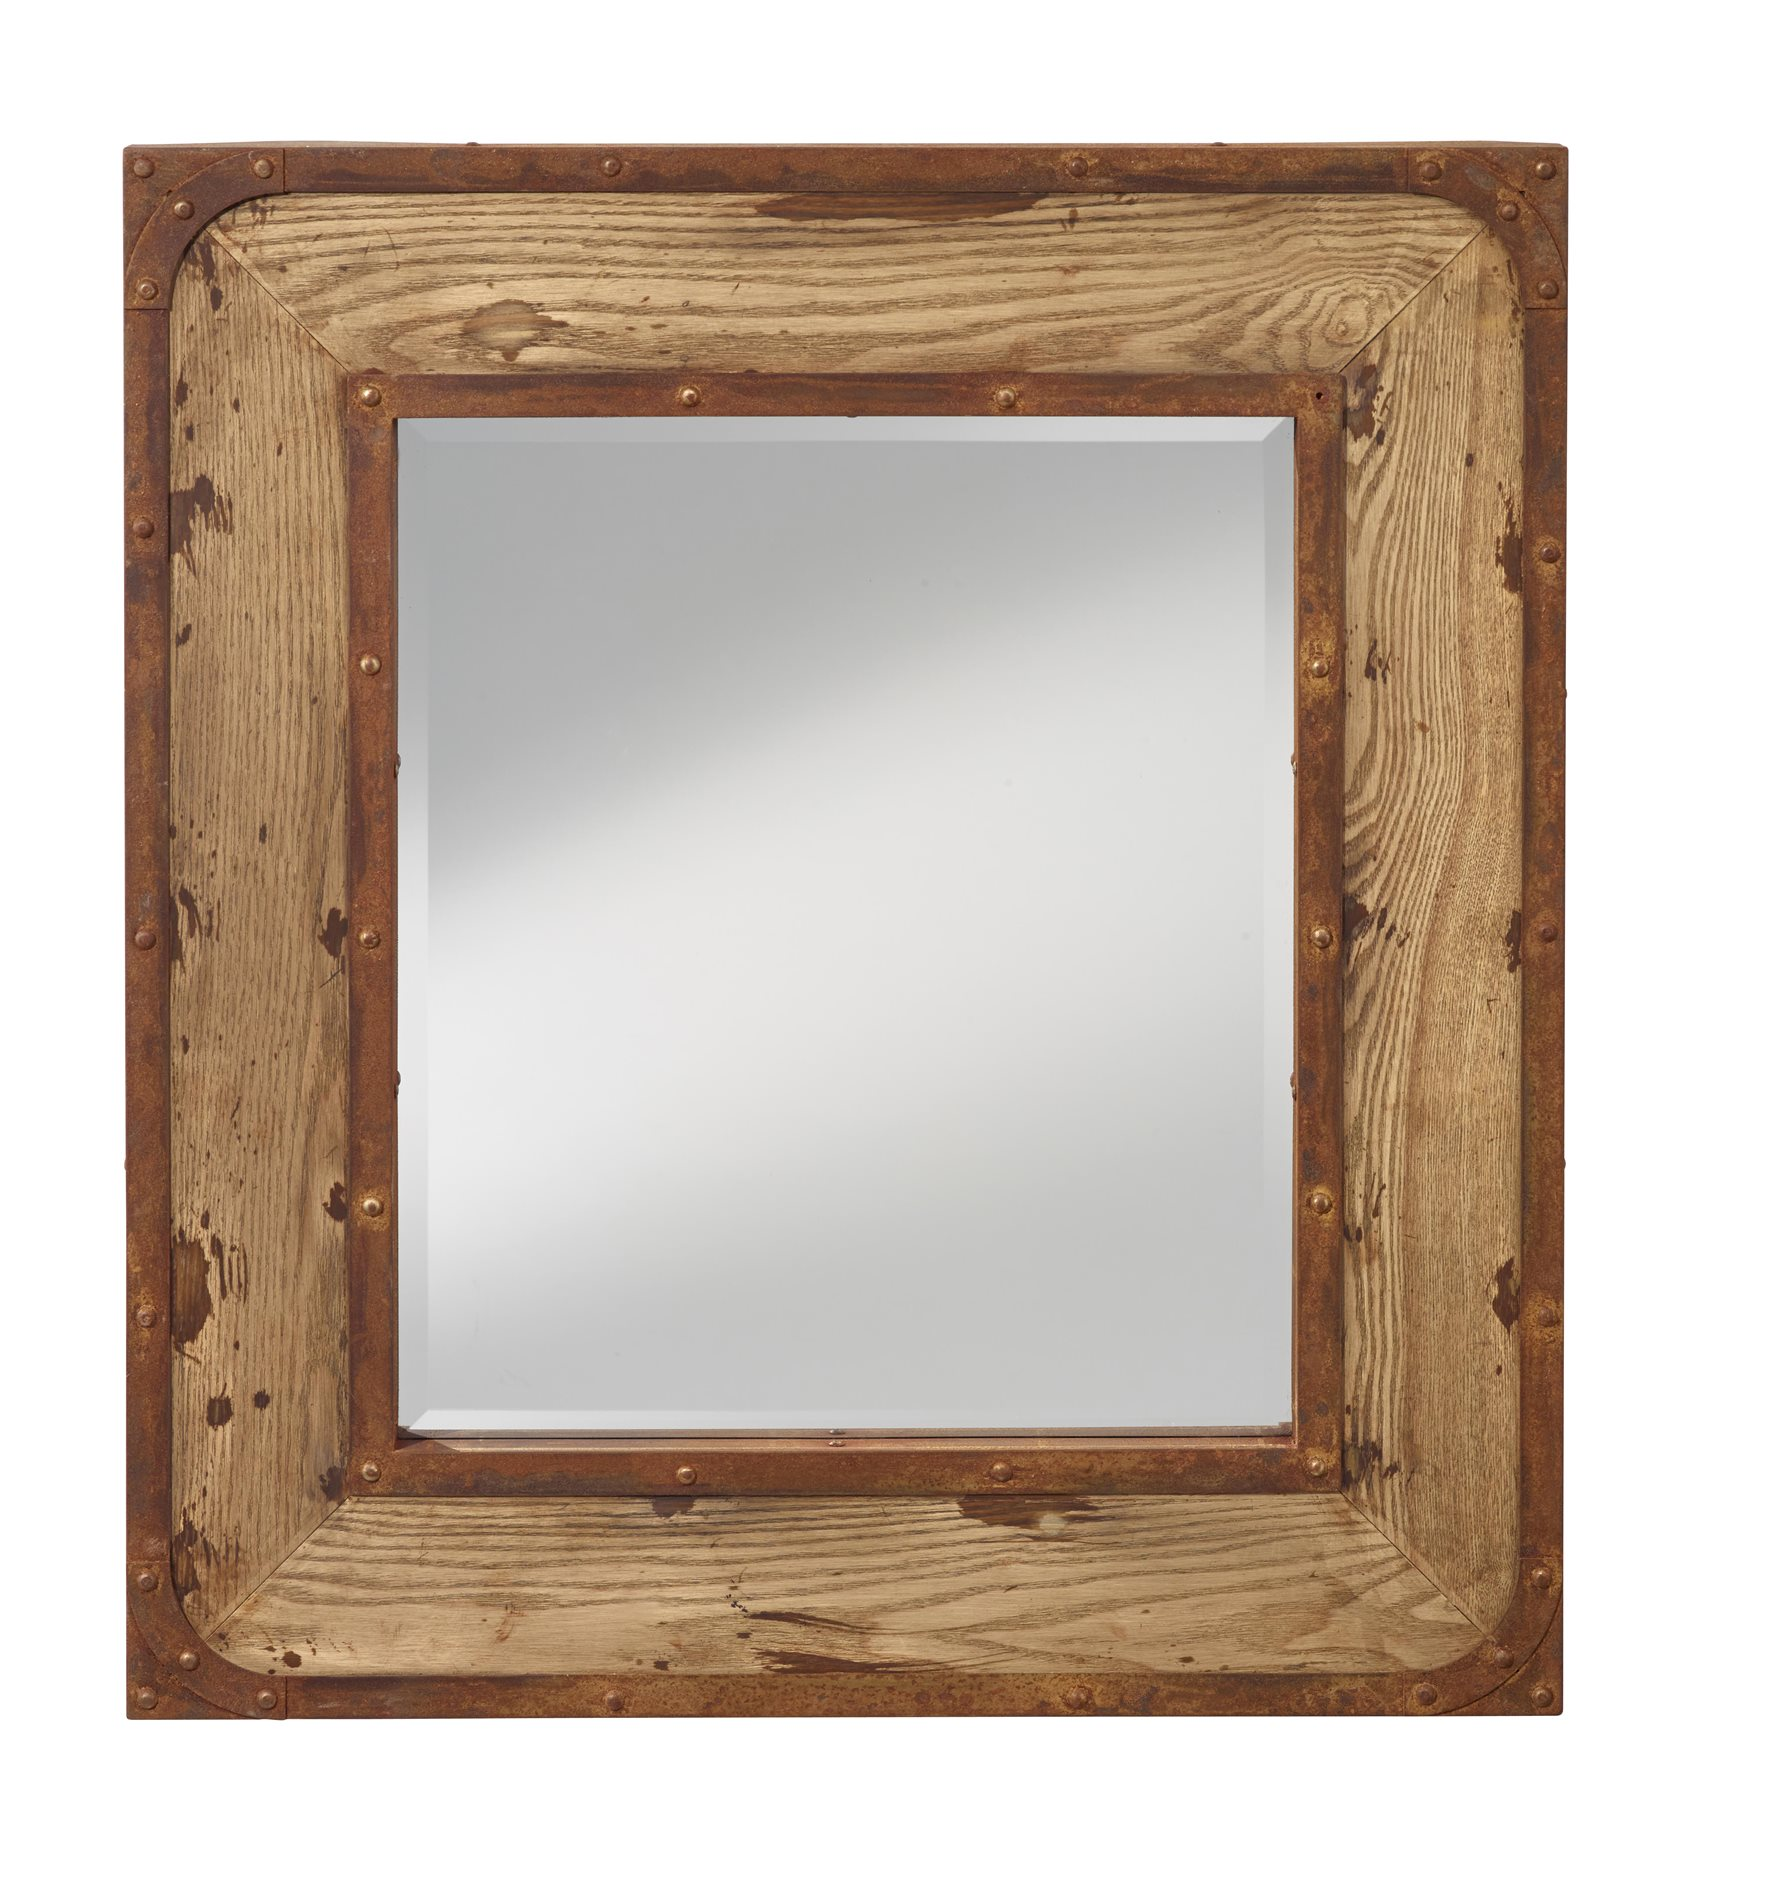 Murray Feiss Mirrors: Murray Feiss MR1227NO Mirror MRF-MR1227NO